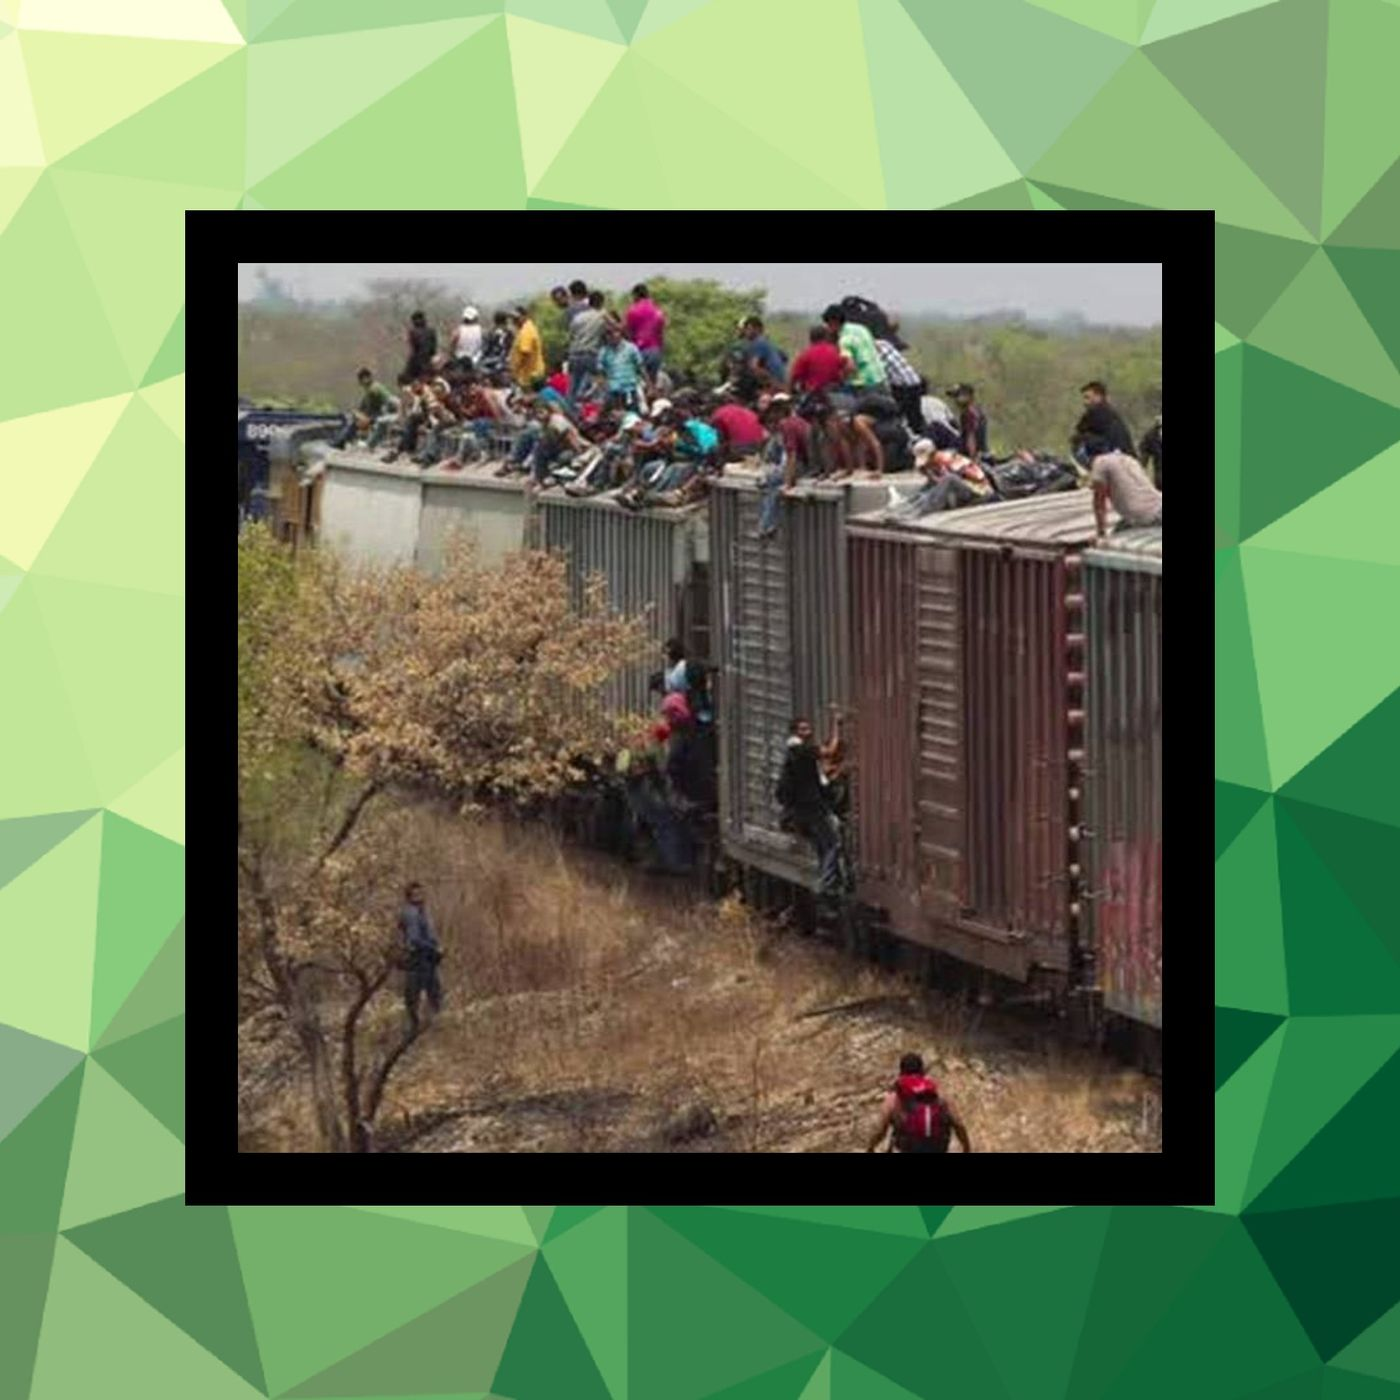 118 - La Bestia, el tren de la muerte